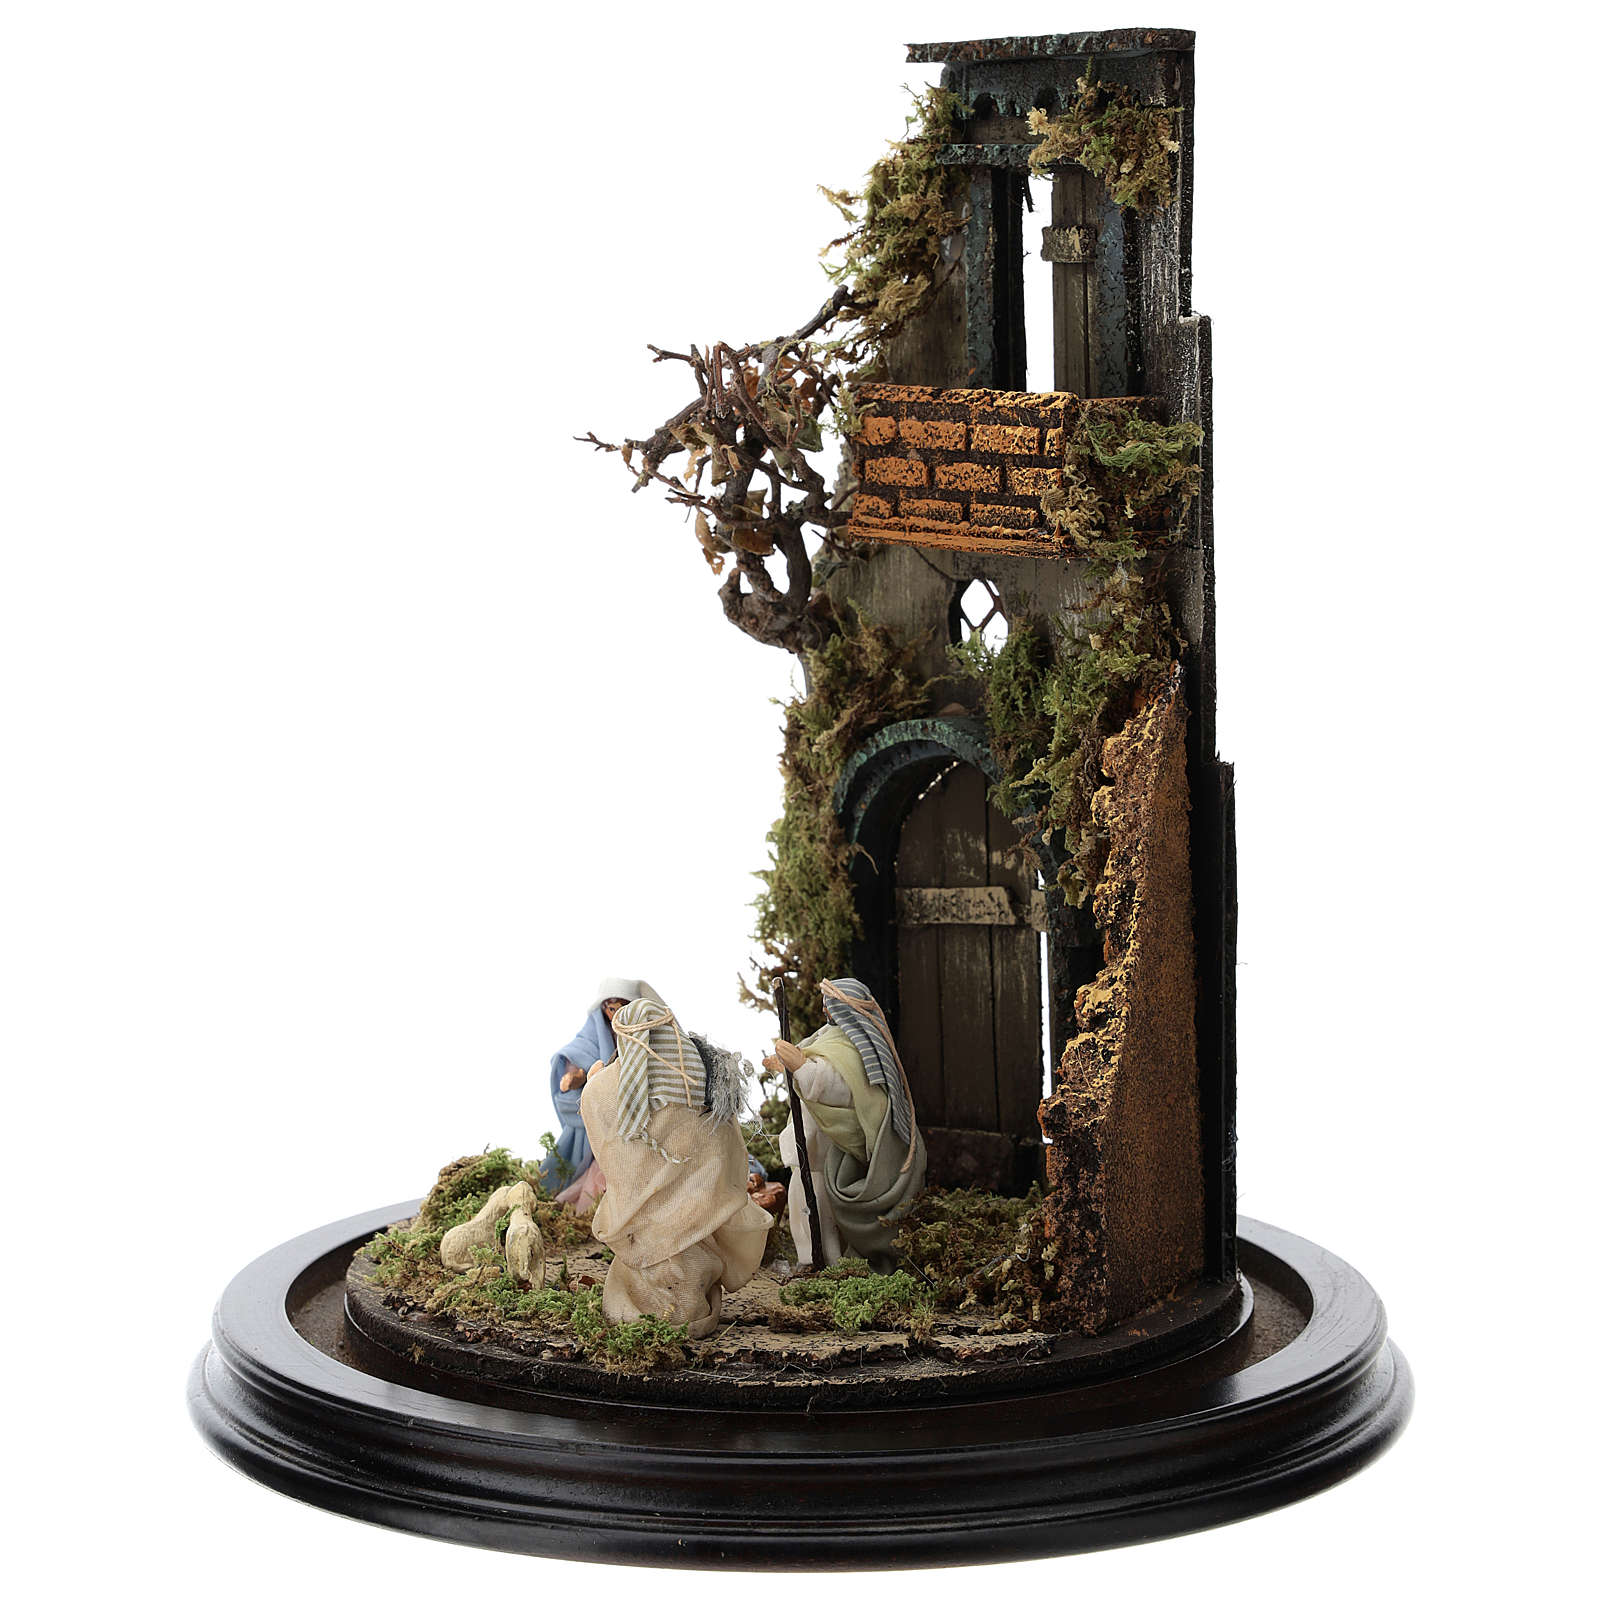 Escena pesebre Sagrada Familia campana vidrio base madera 25 cm Belén Napolitano 4